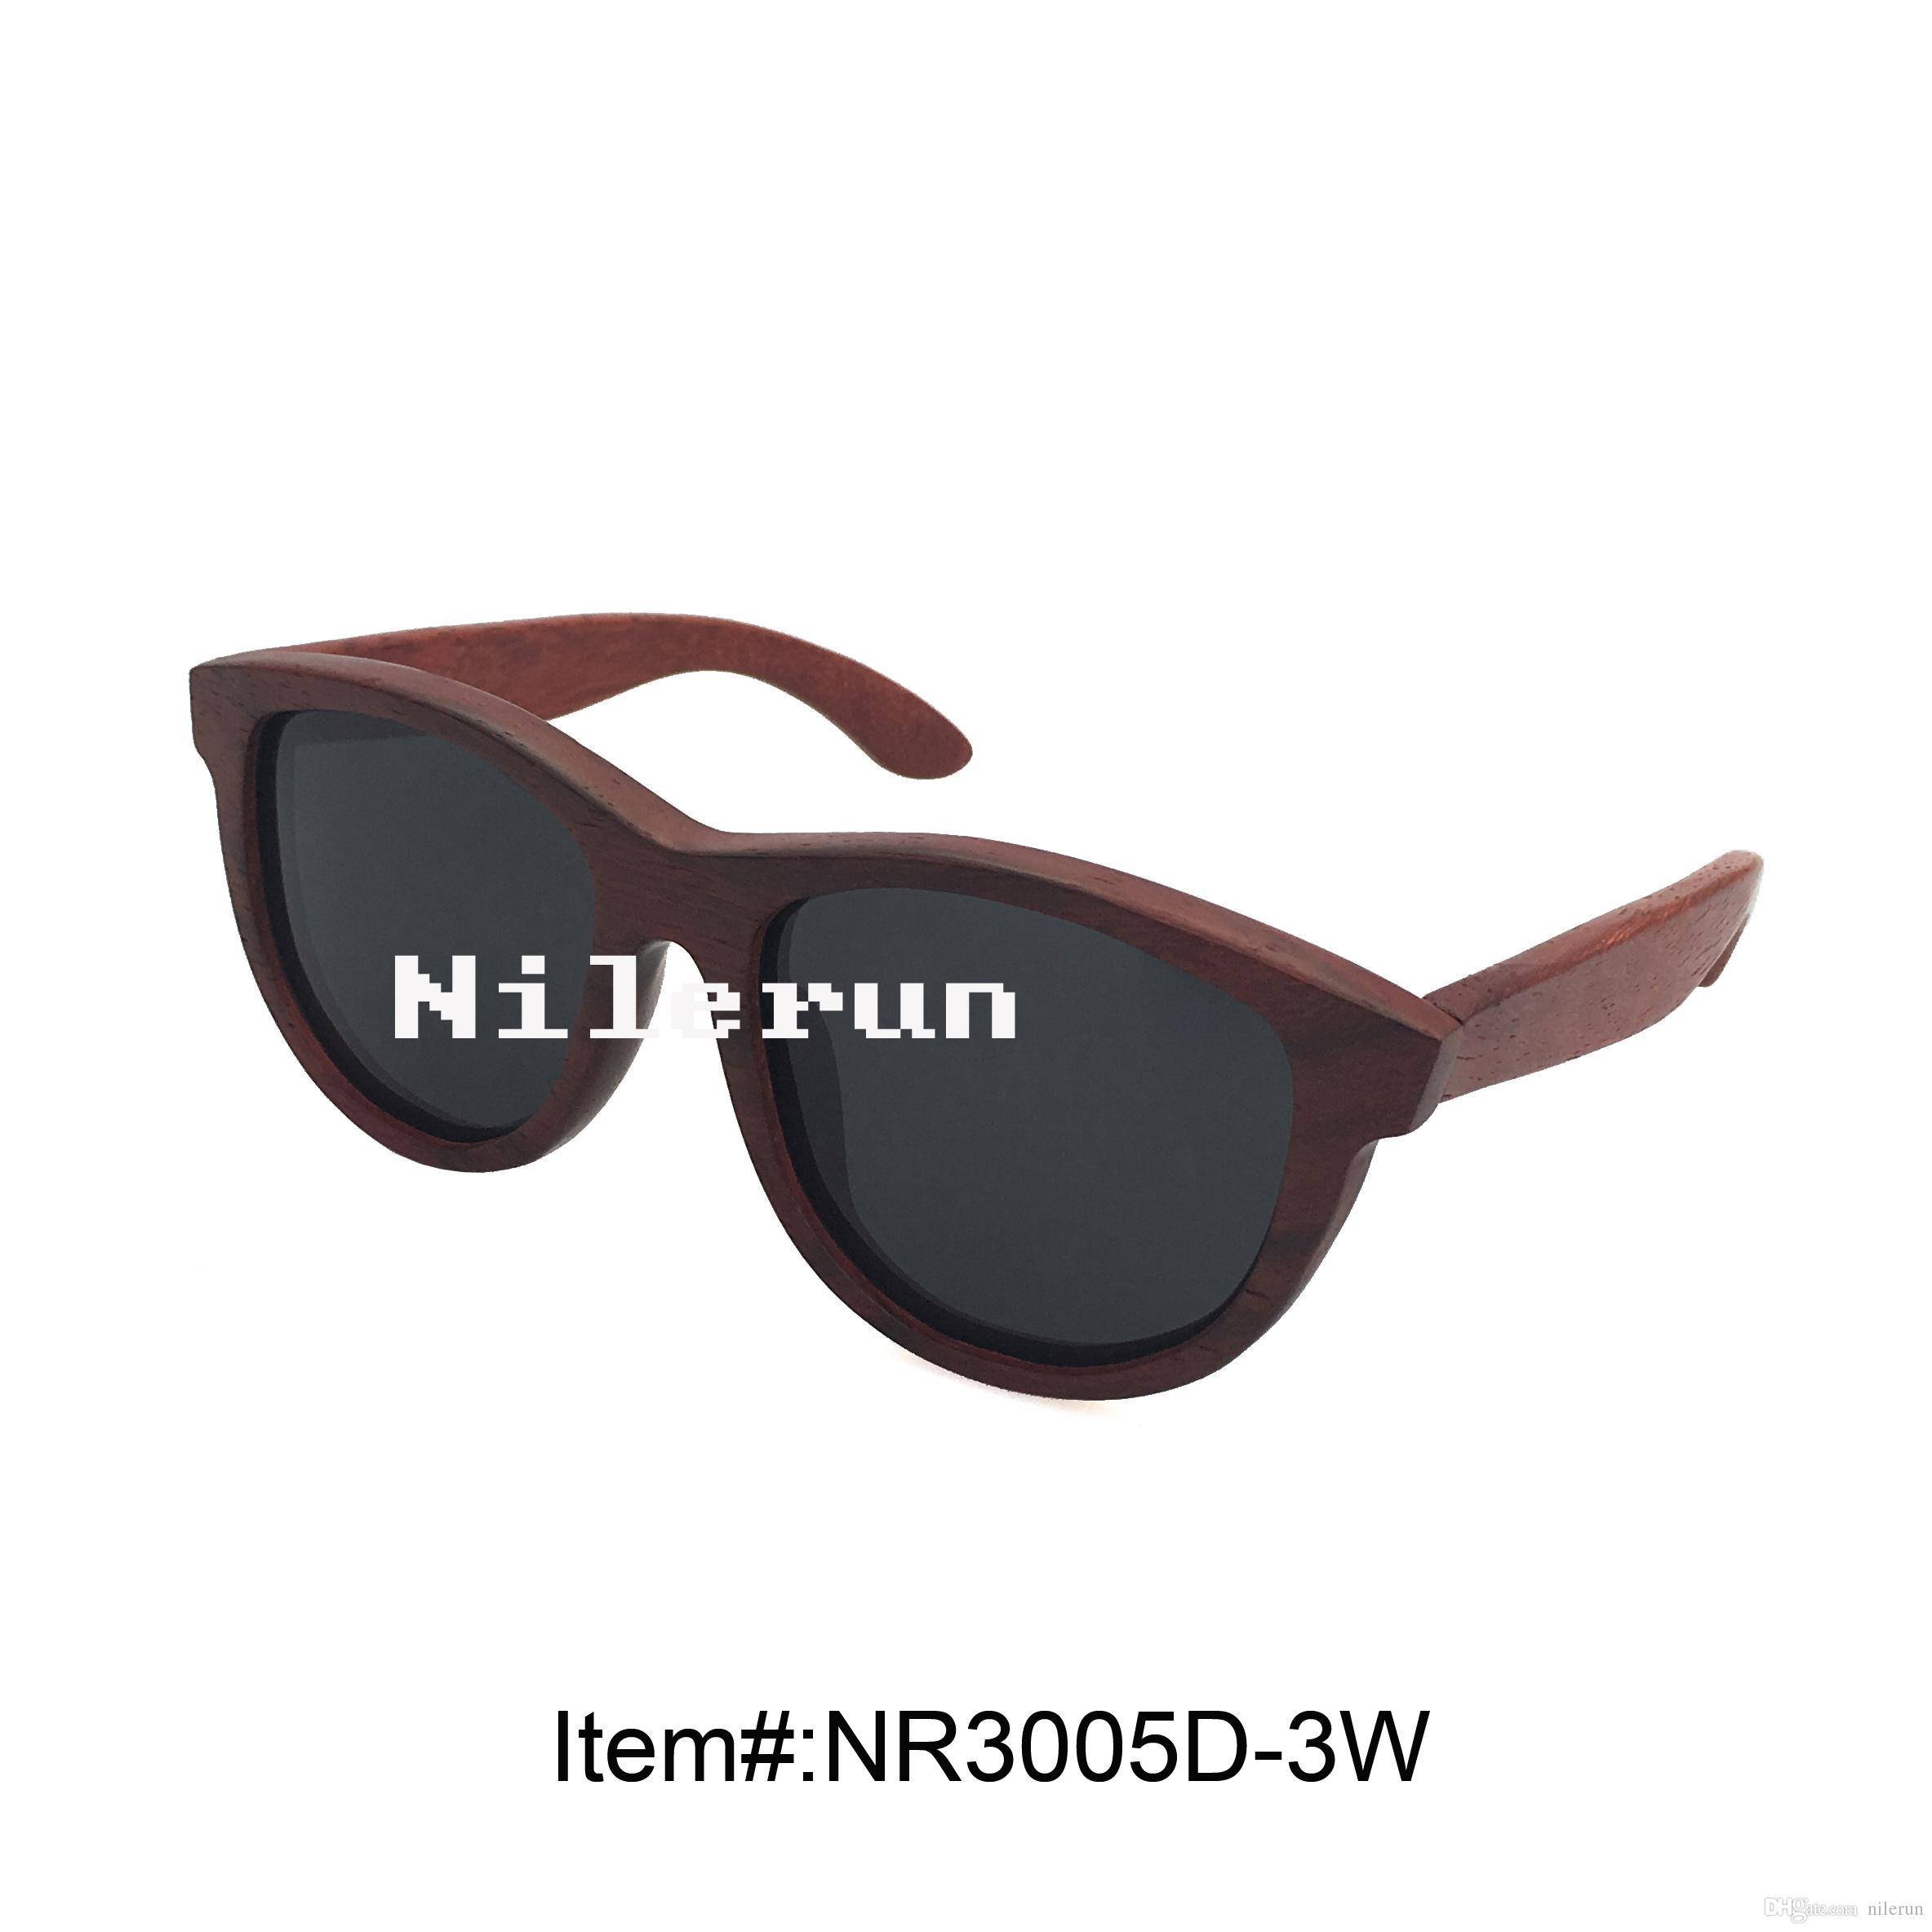 863cc47b84 Compre Lentes Polarizados Grises Grandes De Lujo Importadas Gafas De Sol De  Madera Rojas A $19.29 Del Nilerun | DHgate.Com